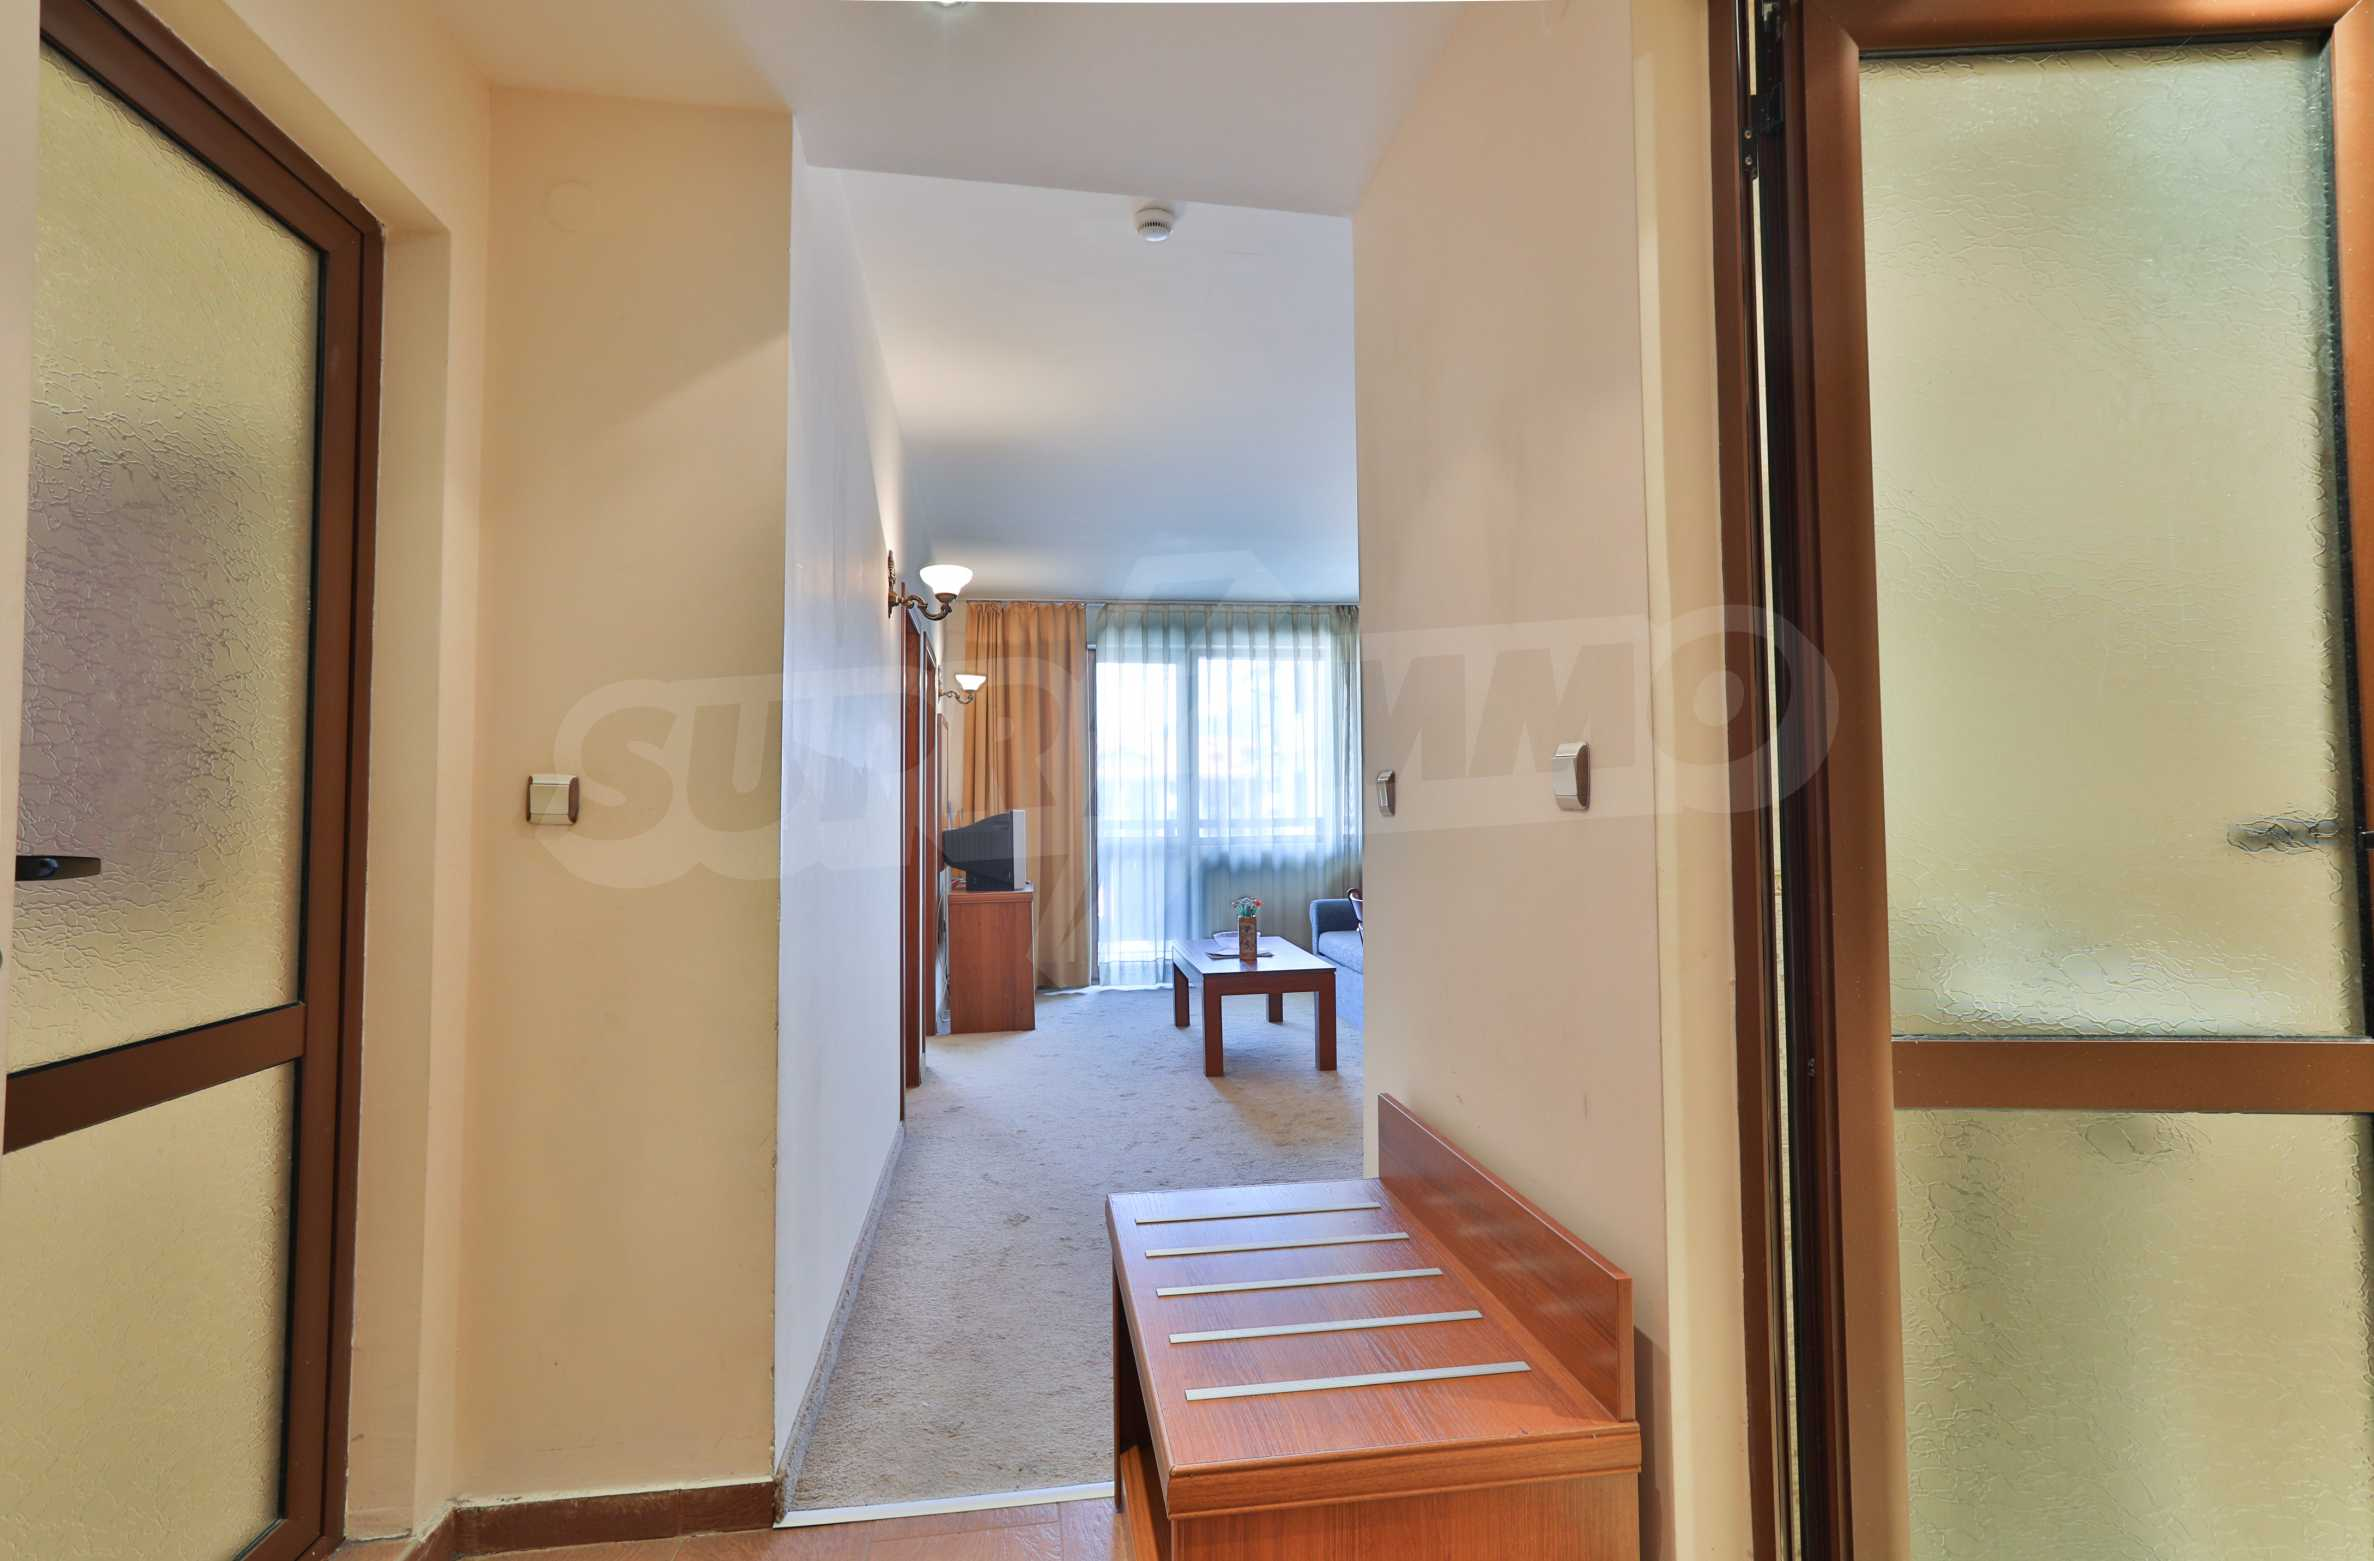 Просторен тристаен апартамент, намиращ се в комплекс Емералд в Банско 8